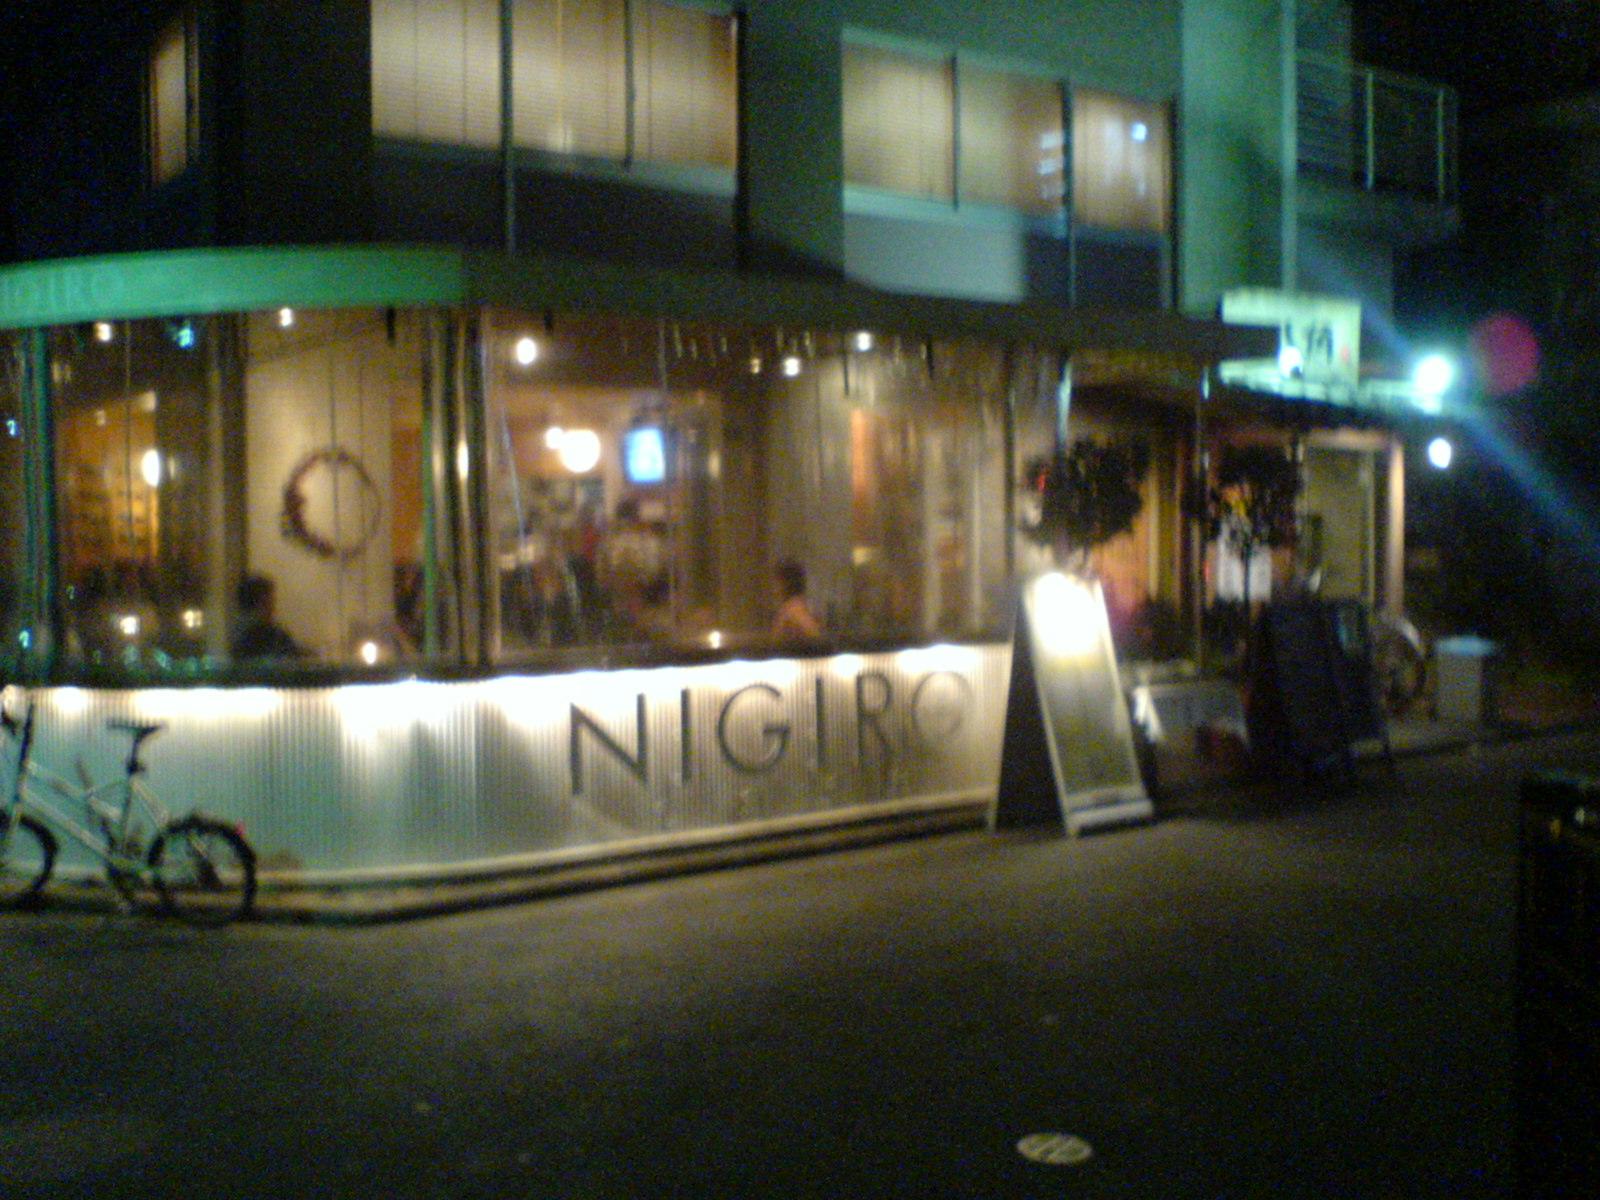 nigiro cafe外観